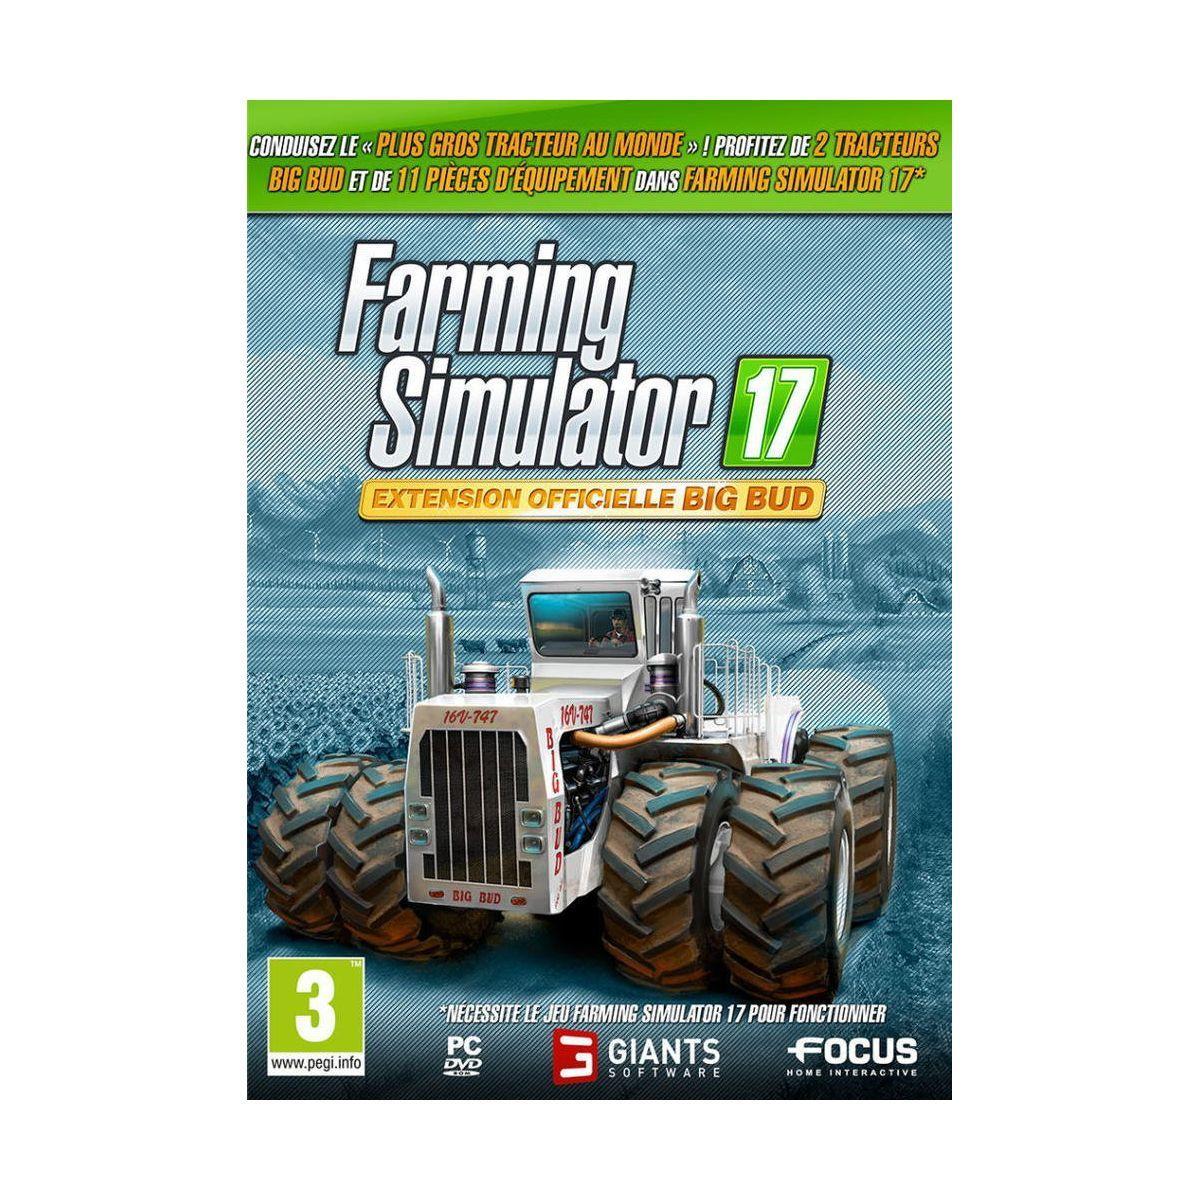 Jeu pc focus farming simulator 2017 exte - 3% de remise immédiate avec le code : multi3 (photo)